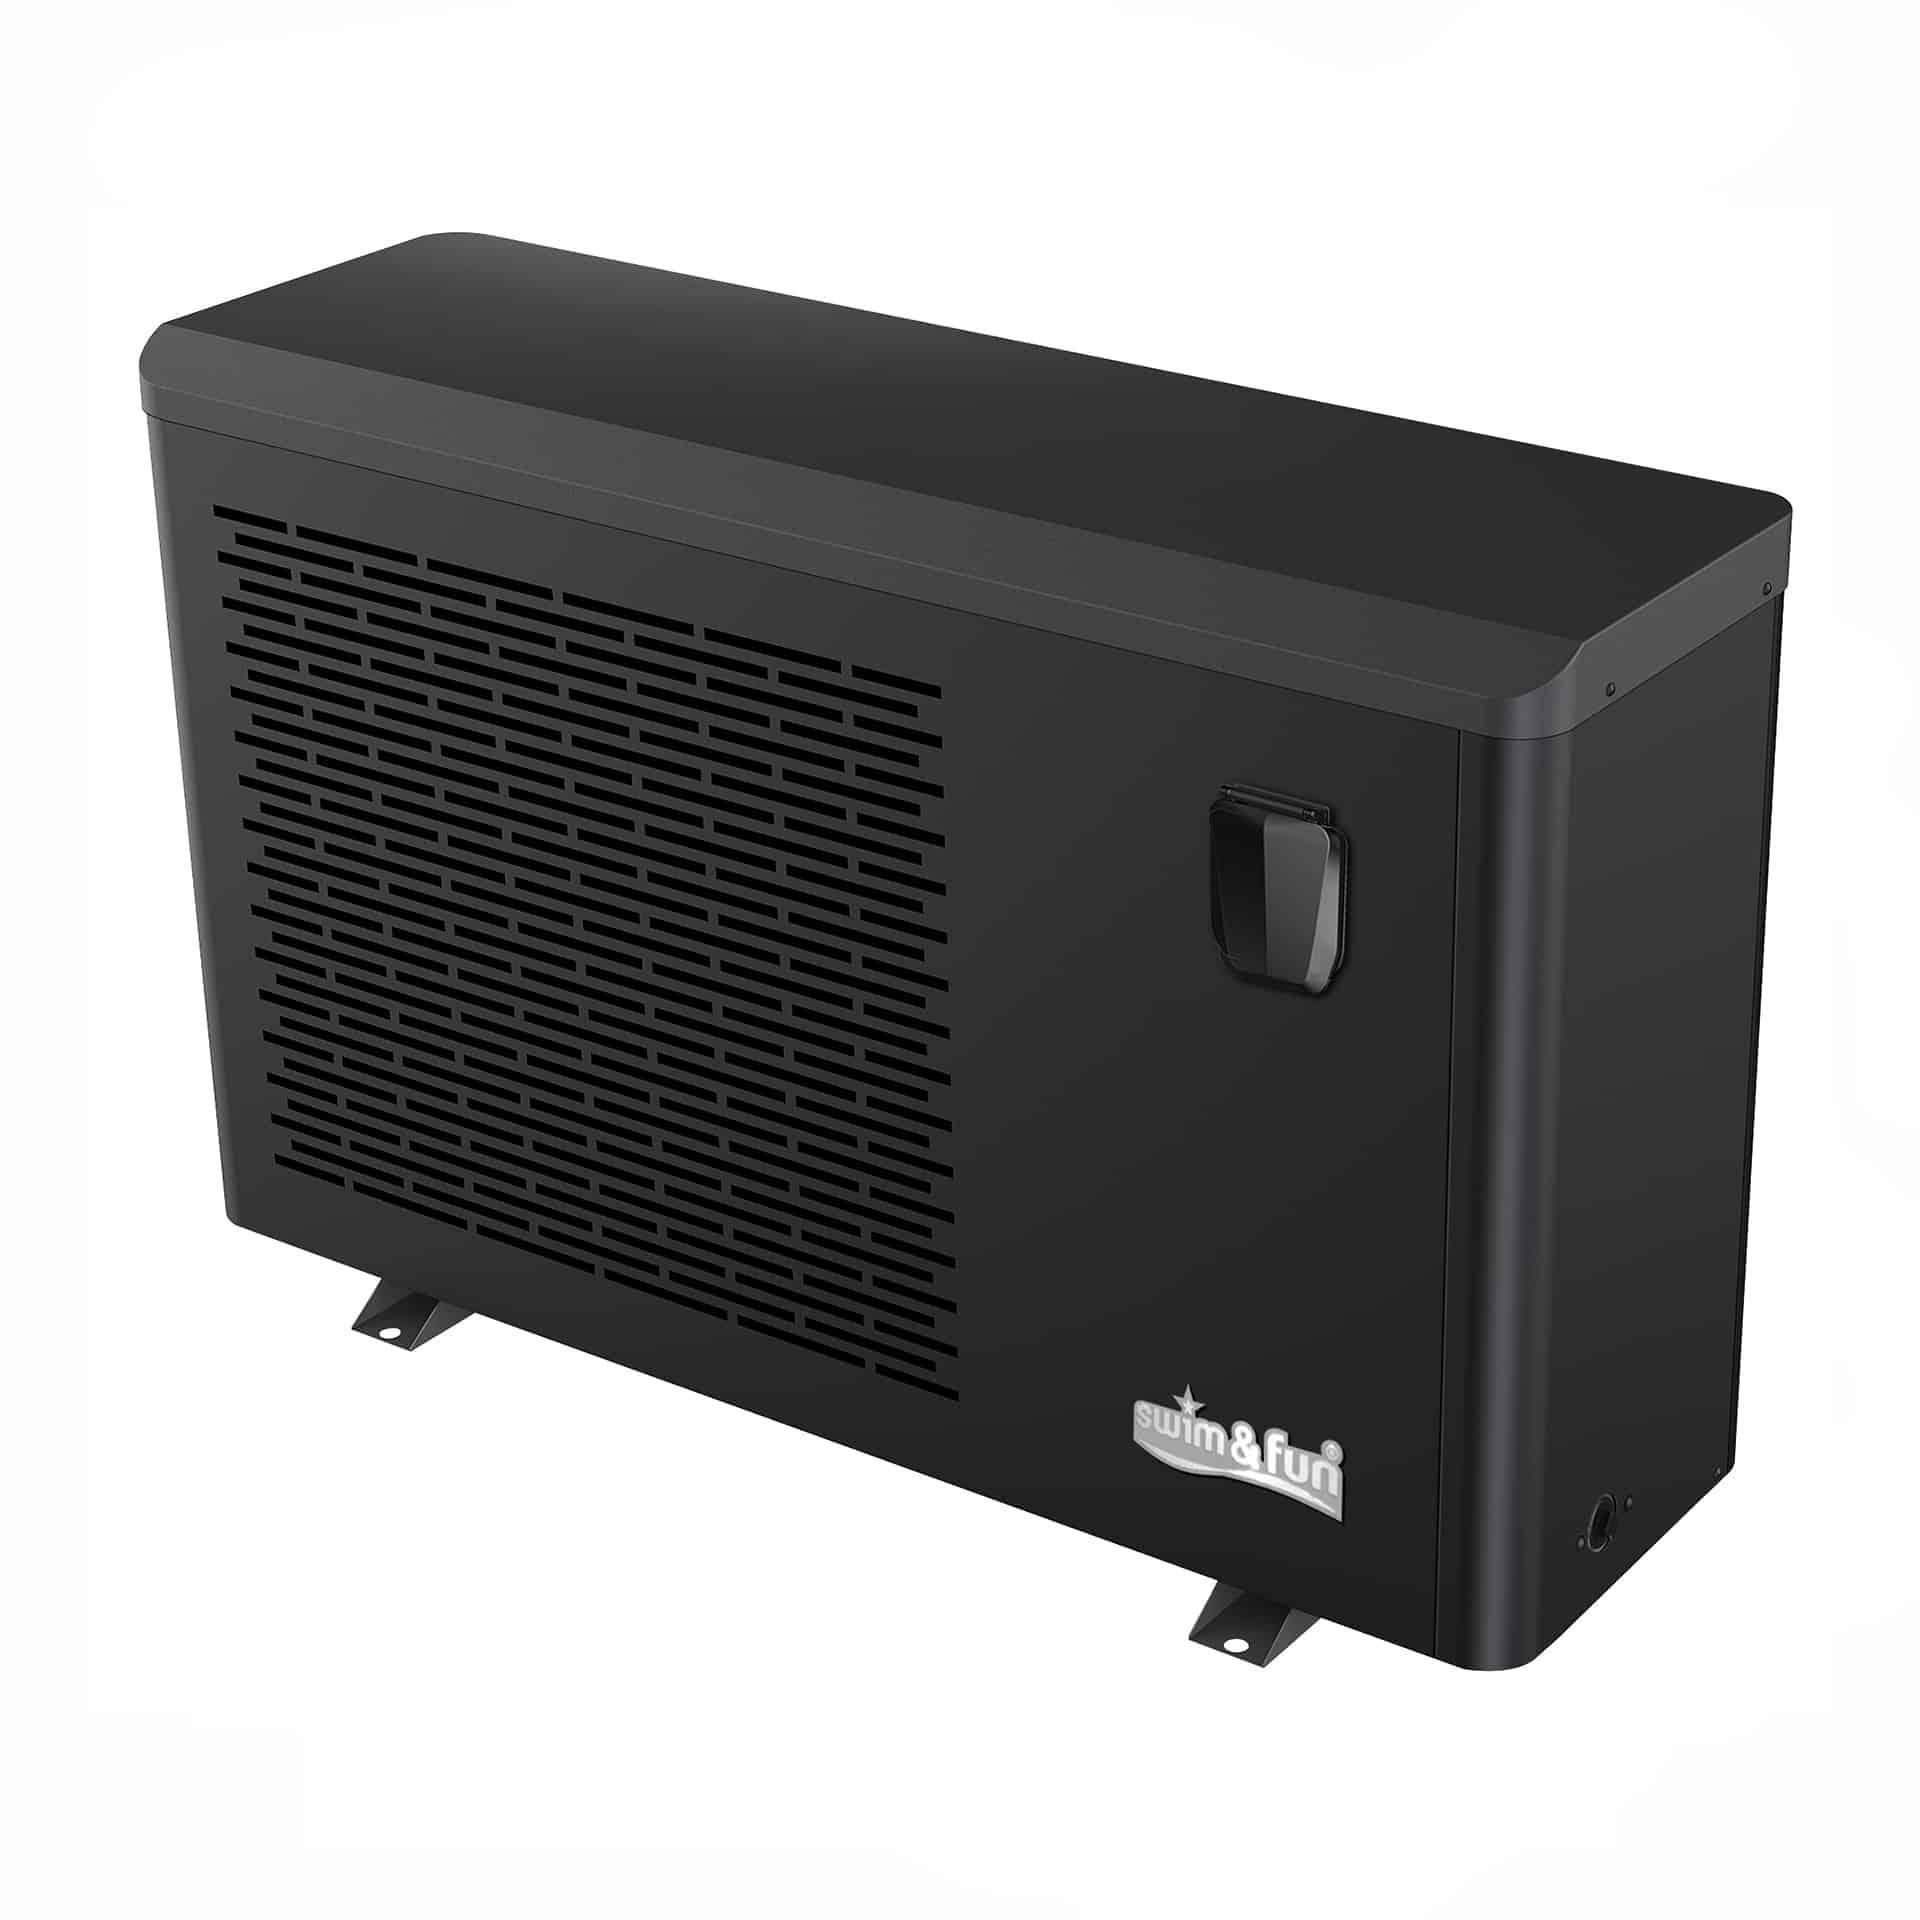 HeatBooster Pro Varmepumpe med WiFi 16 KW